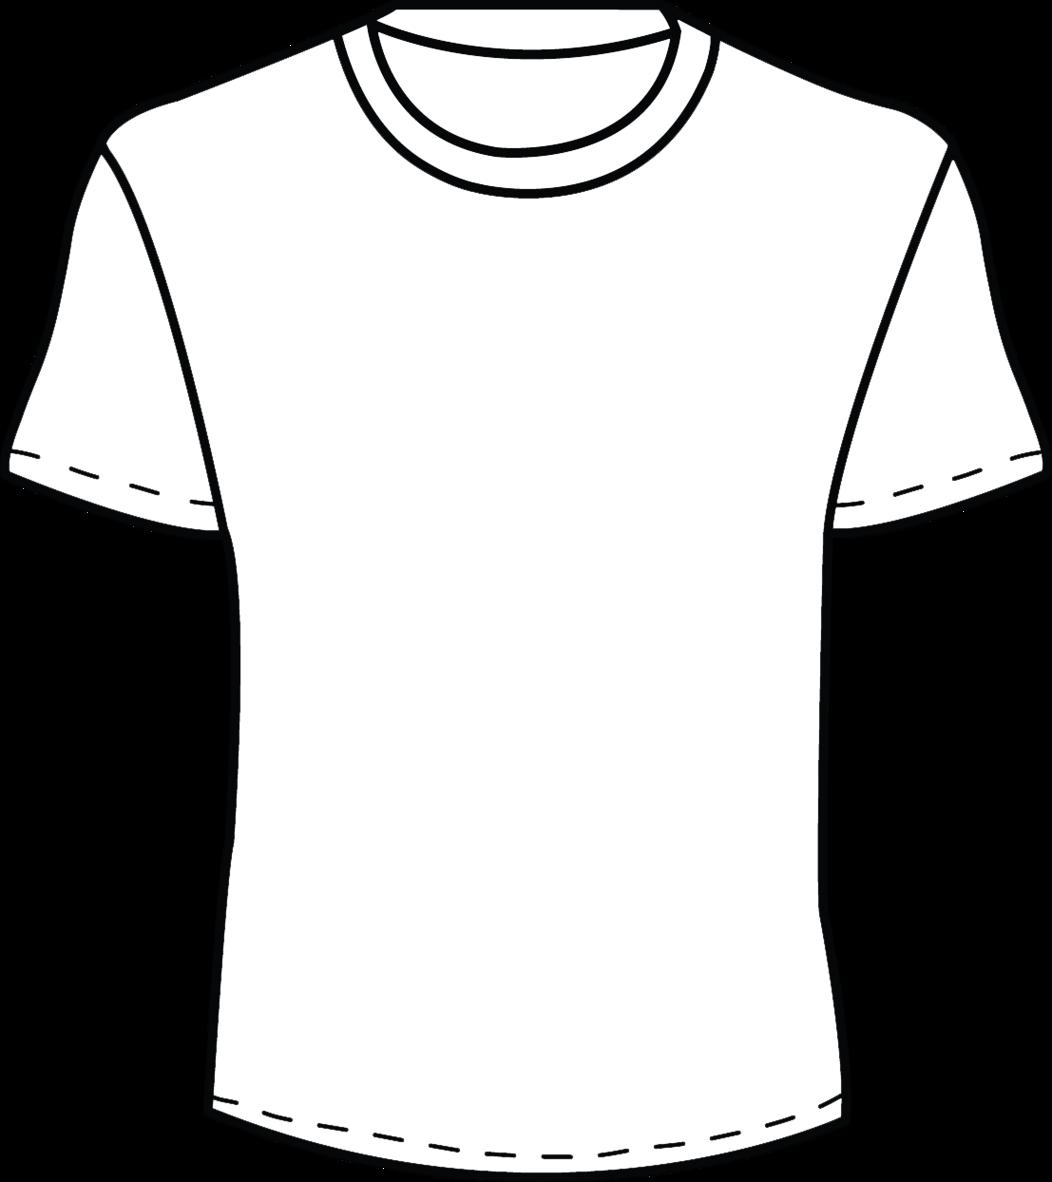 t shirt coloring page t shirt coloring page free printable coloring pages t page shirt coloring